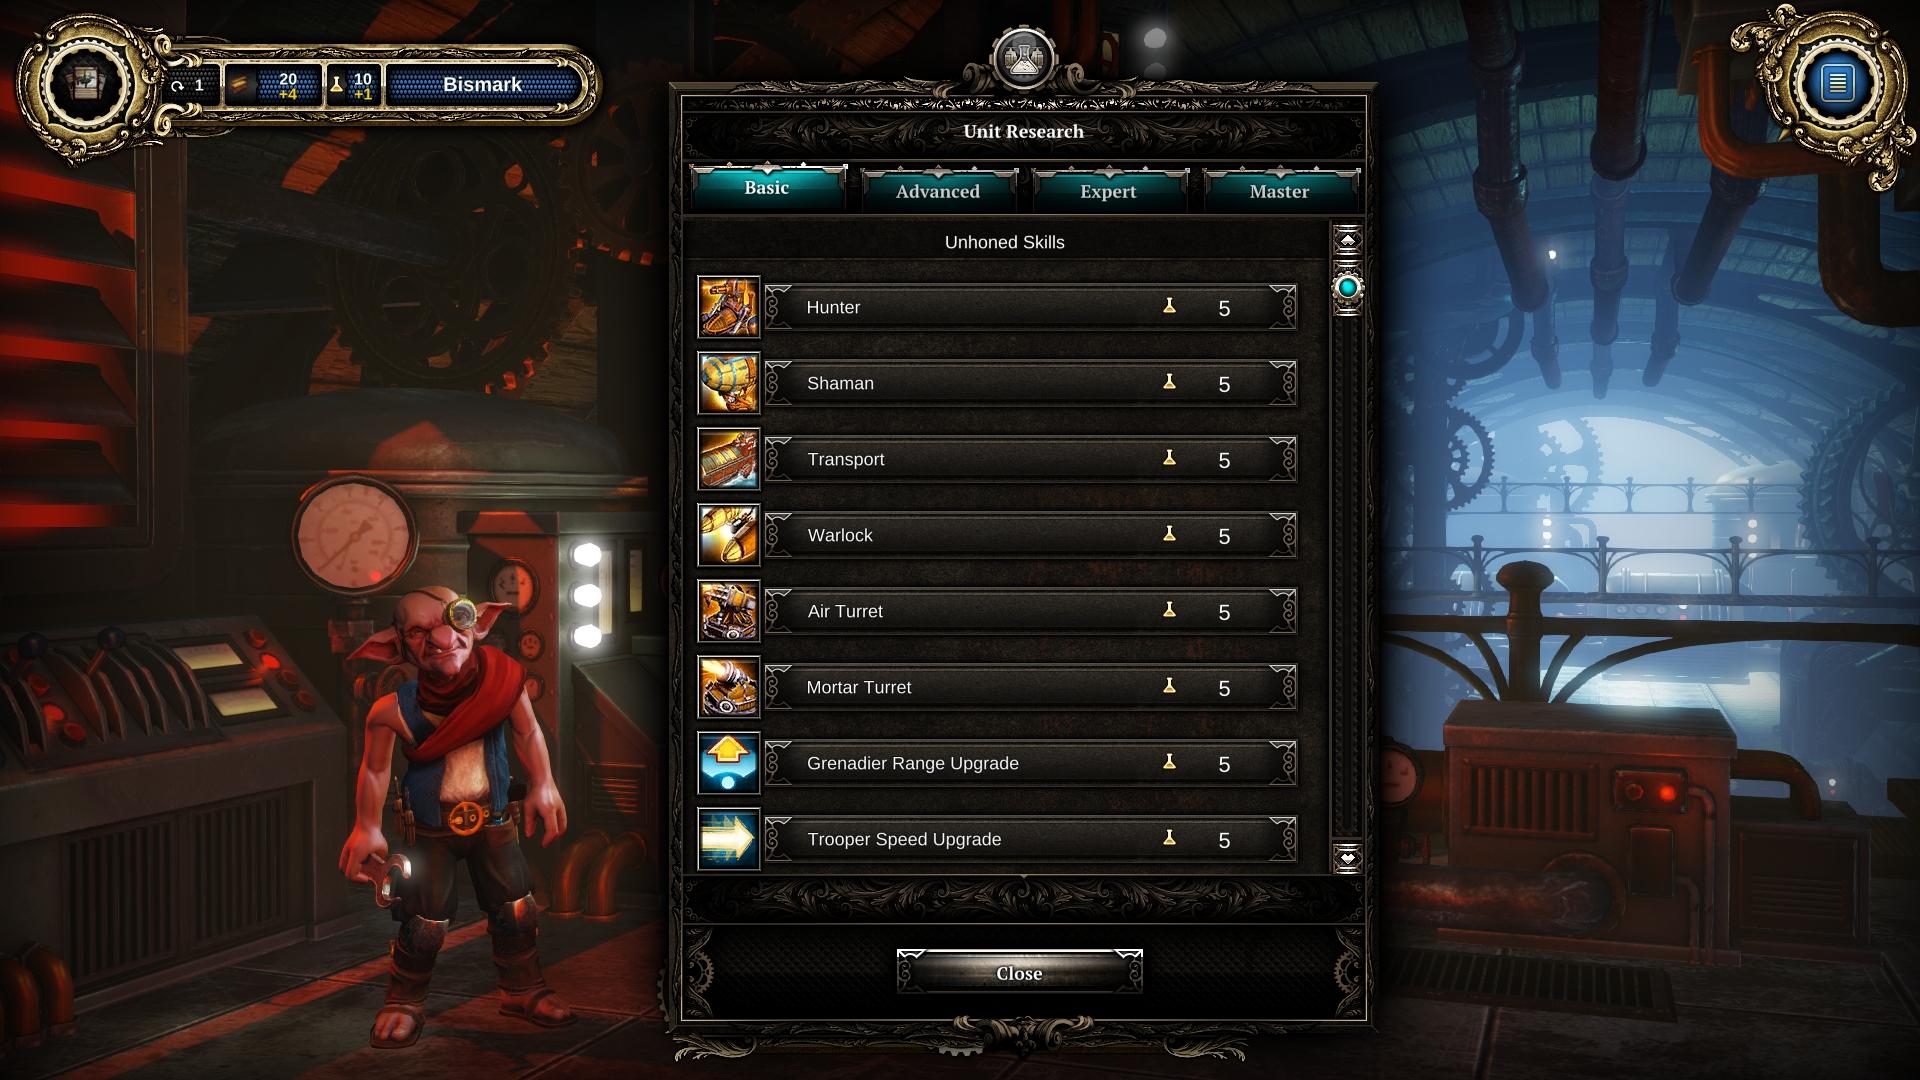 Divinity: Dragon Commander - скриншоты, обои, картинки